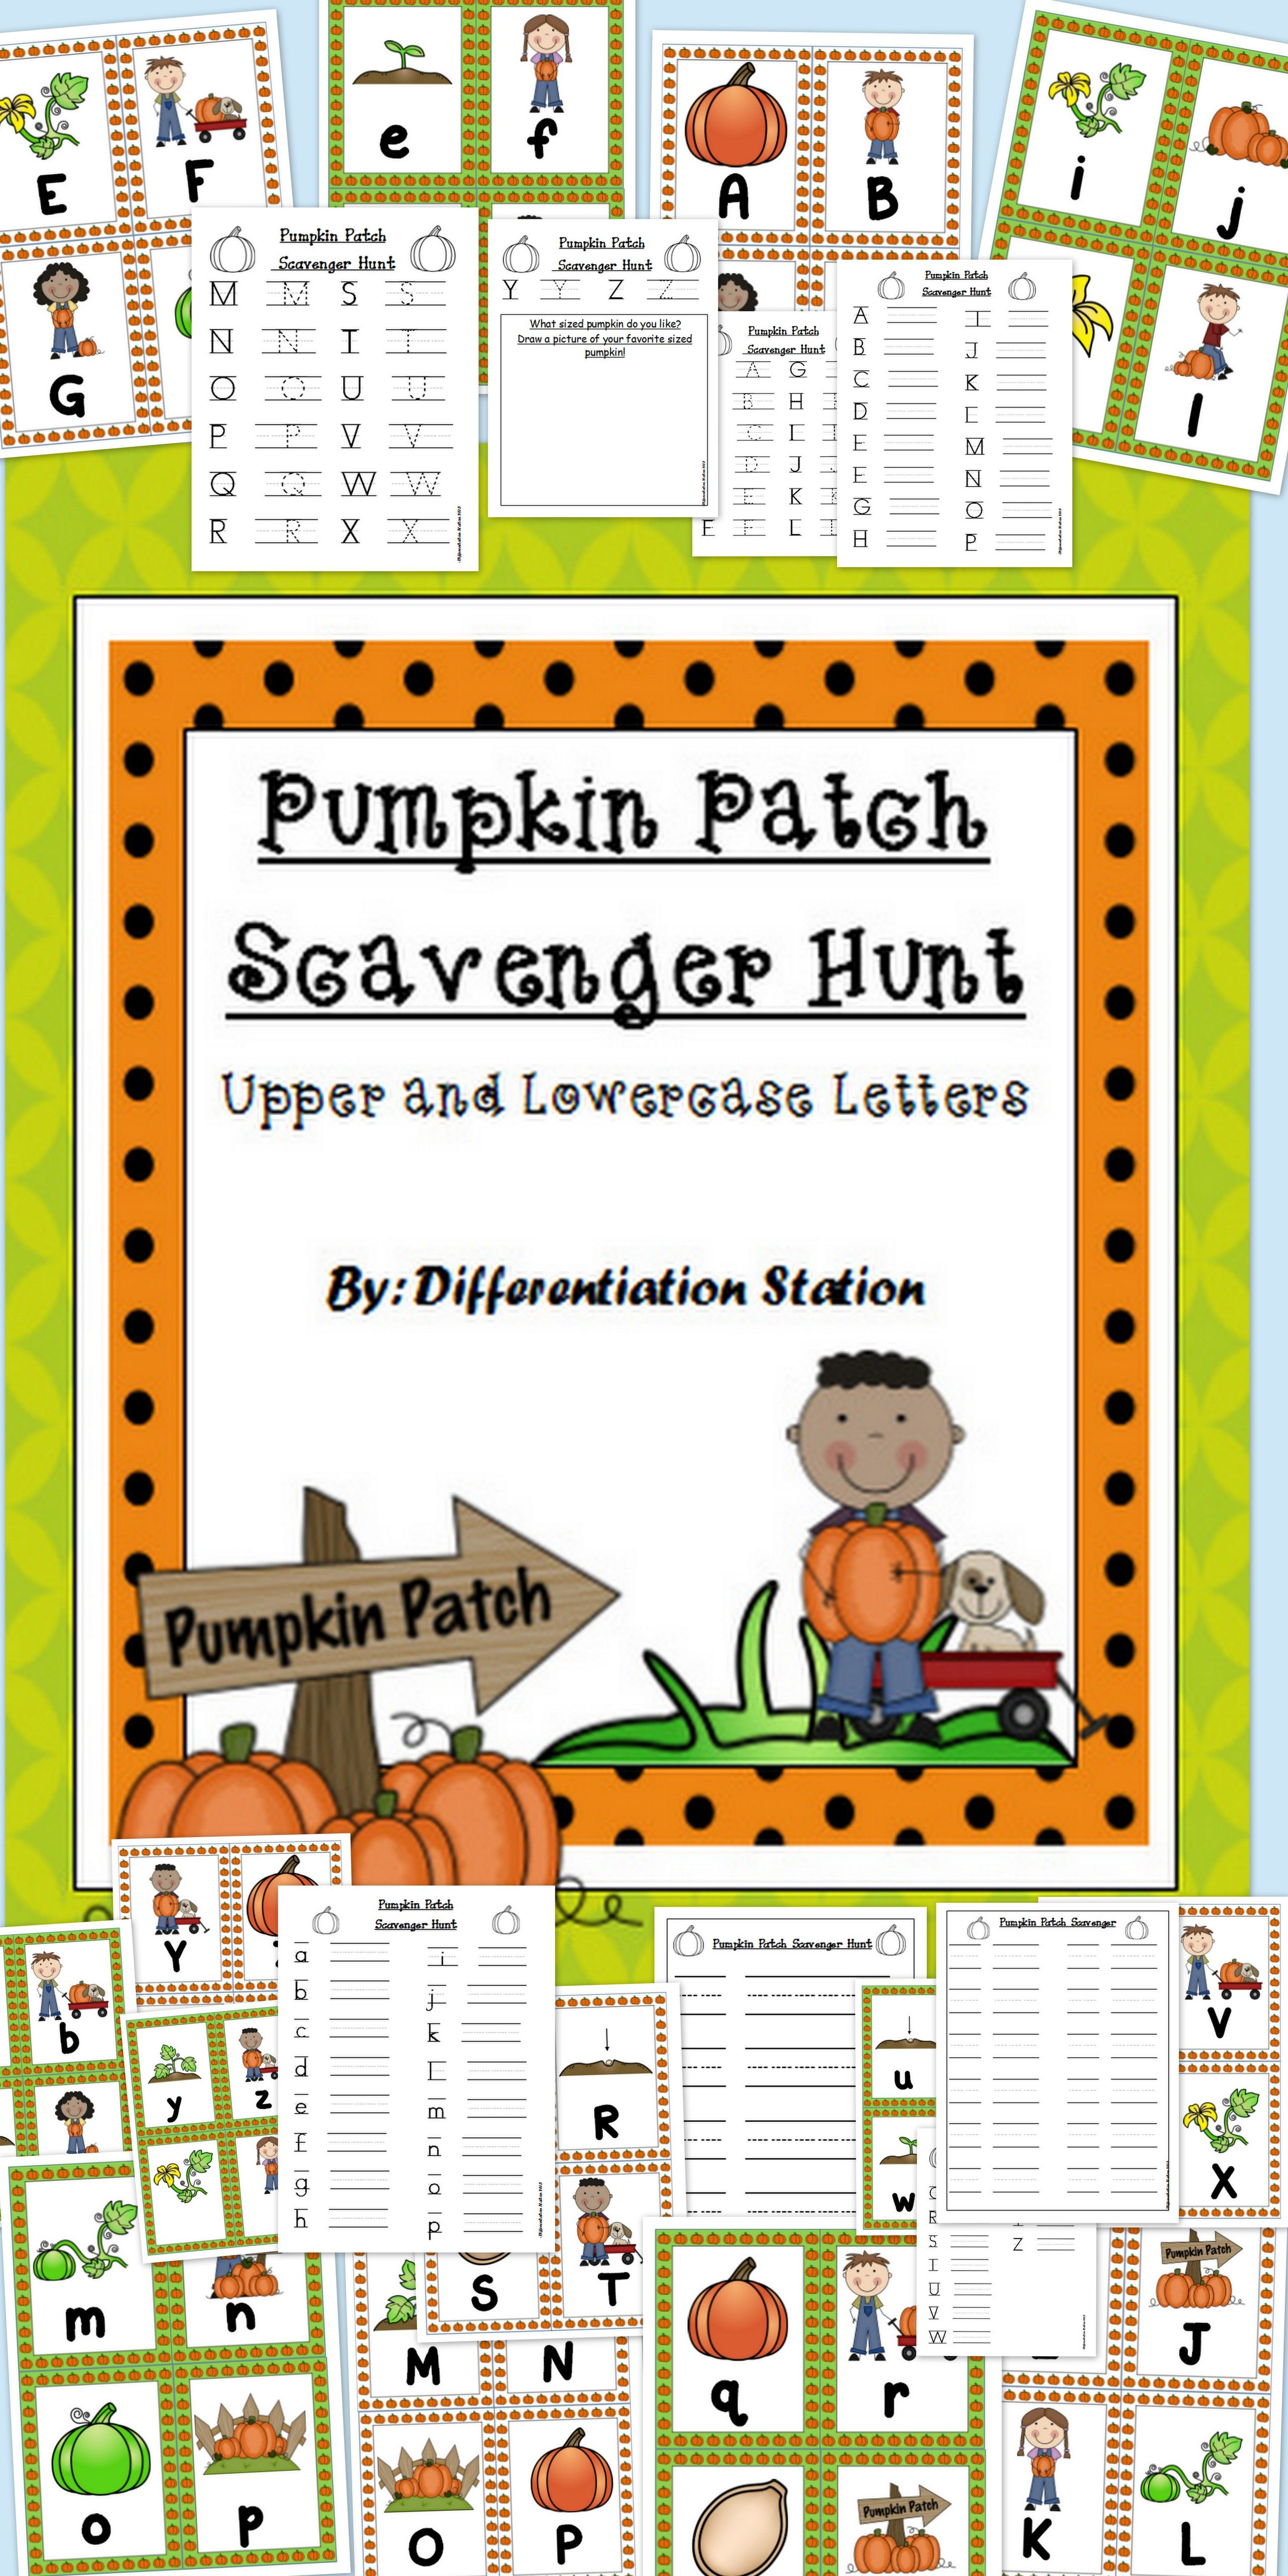 Pumpkin Patch Scavenger Hunt Upper And Lowercase Alphabet